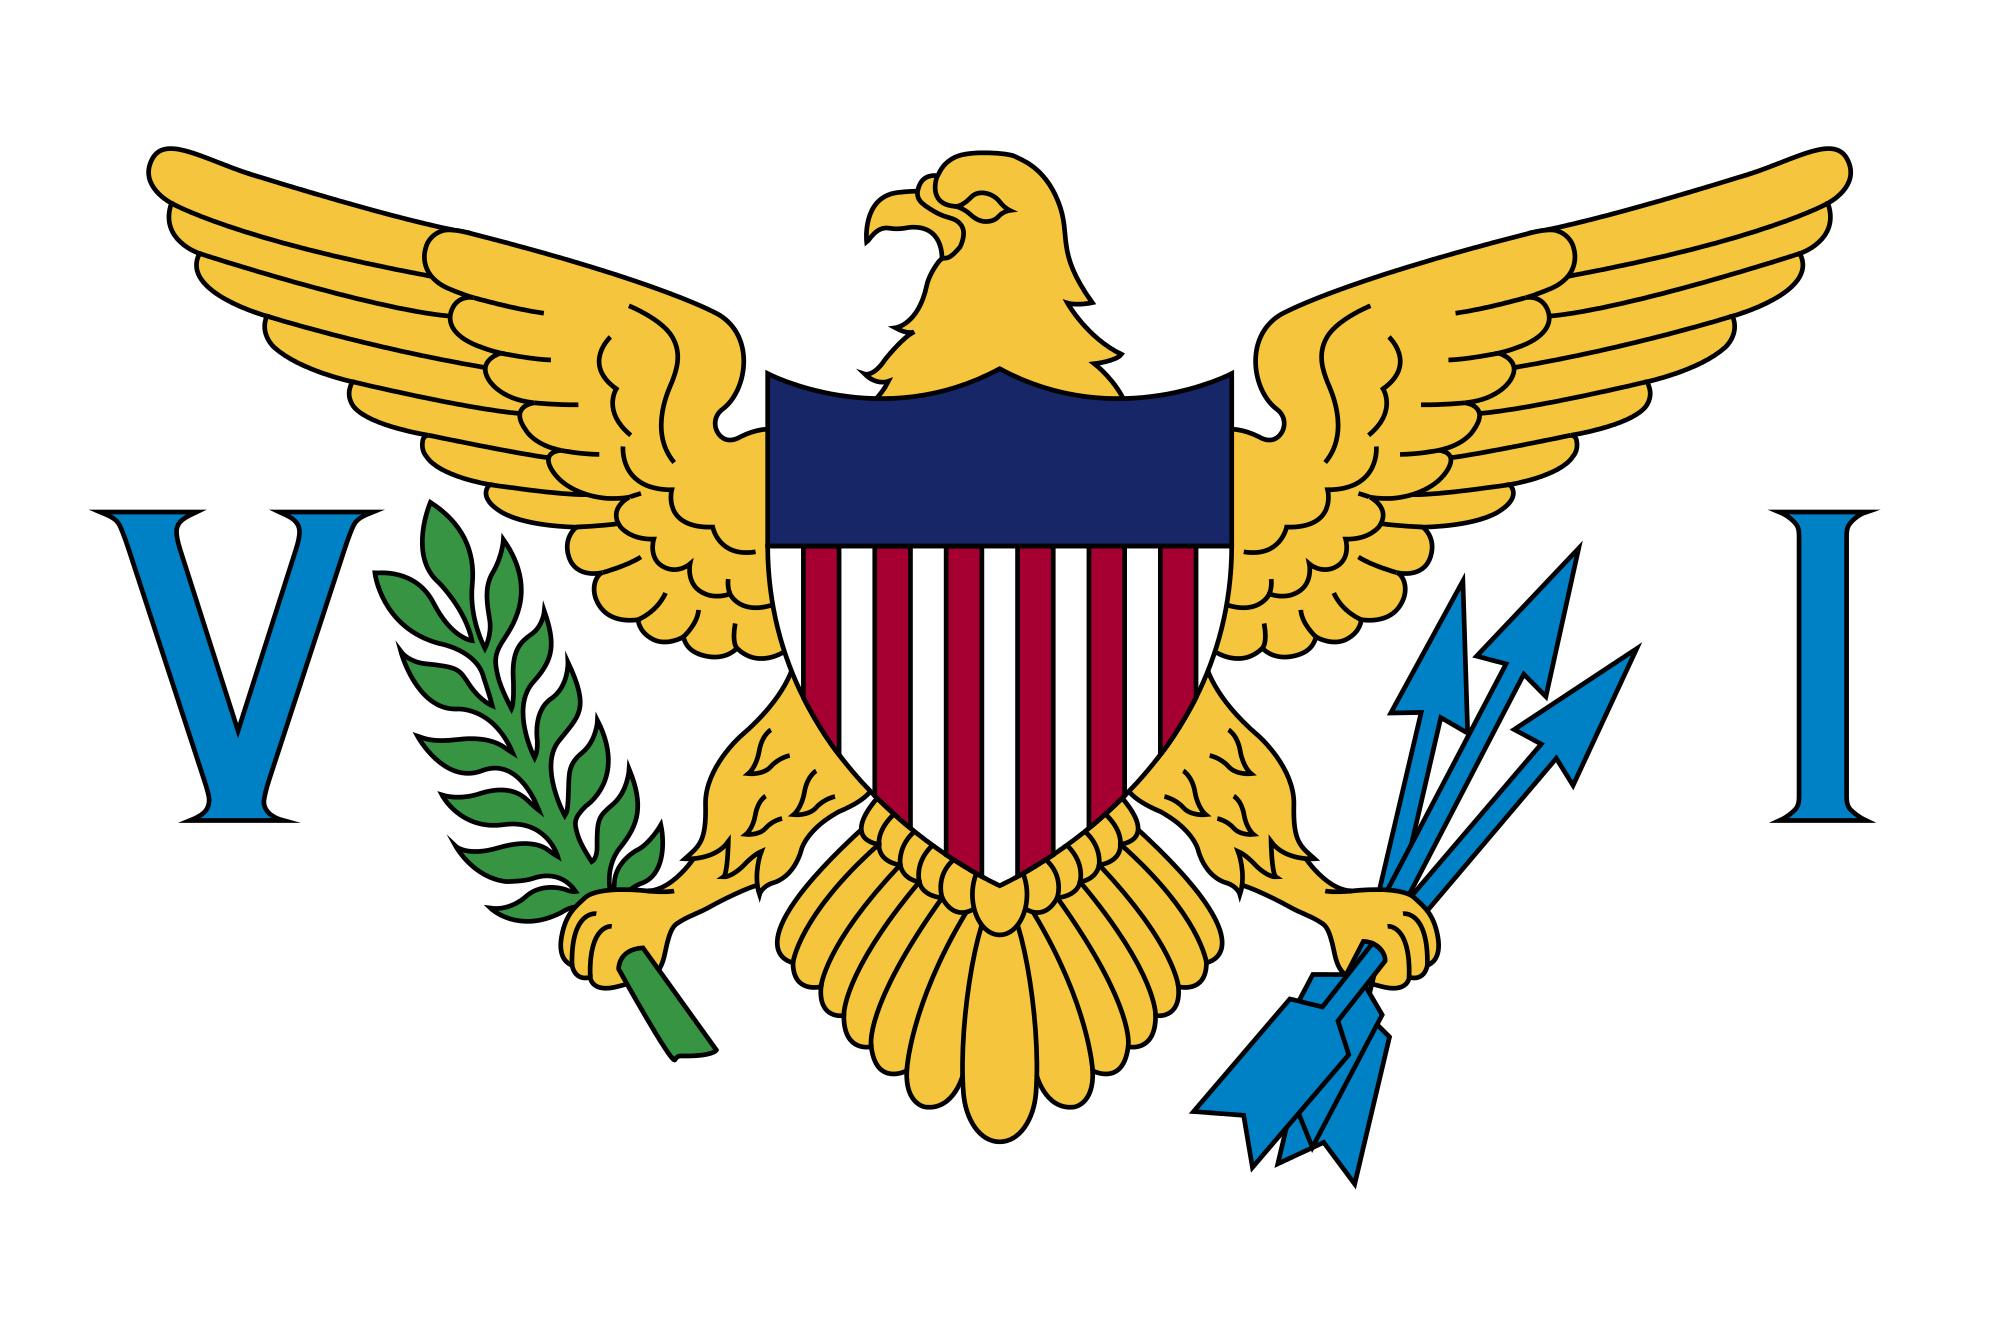 islas virgenes estadounidenses, paese, emblema, logo, simbolo - Sfondi HD - Professor-falken.com